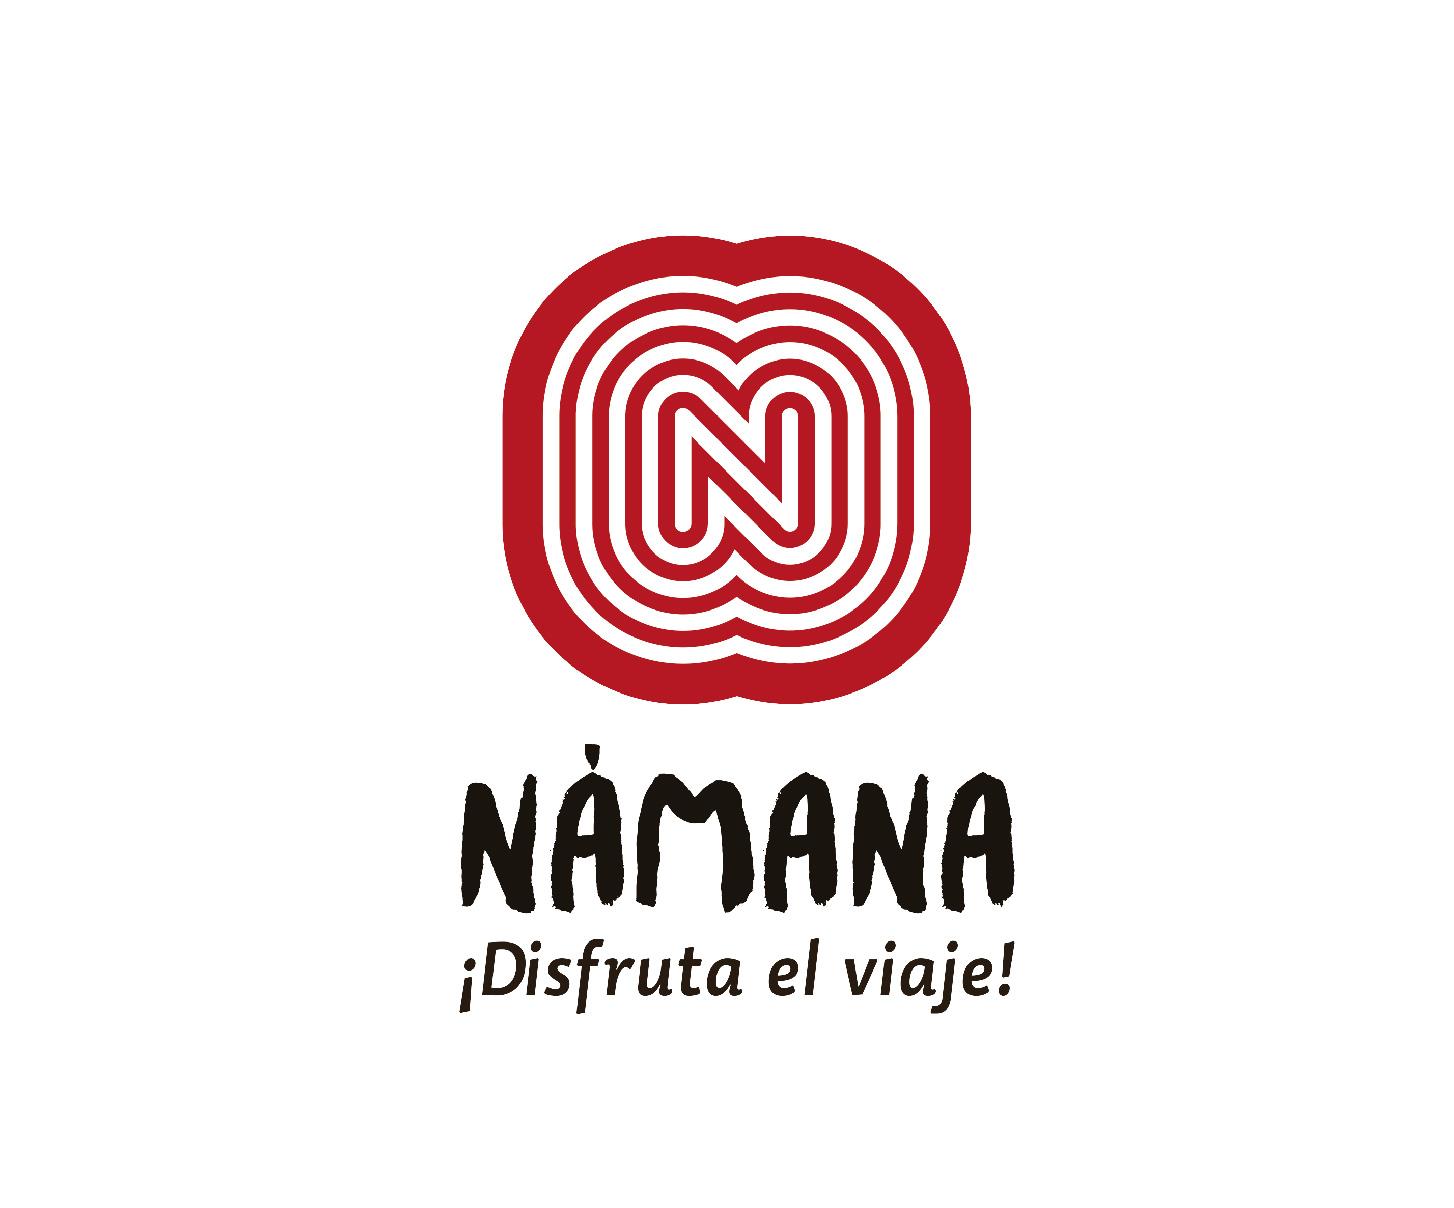 namana